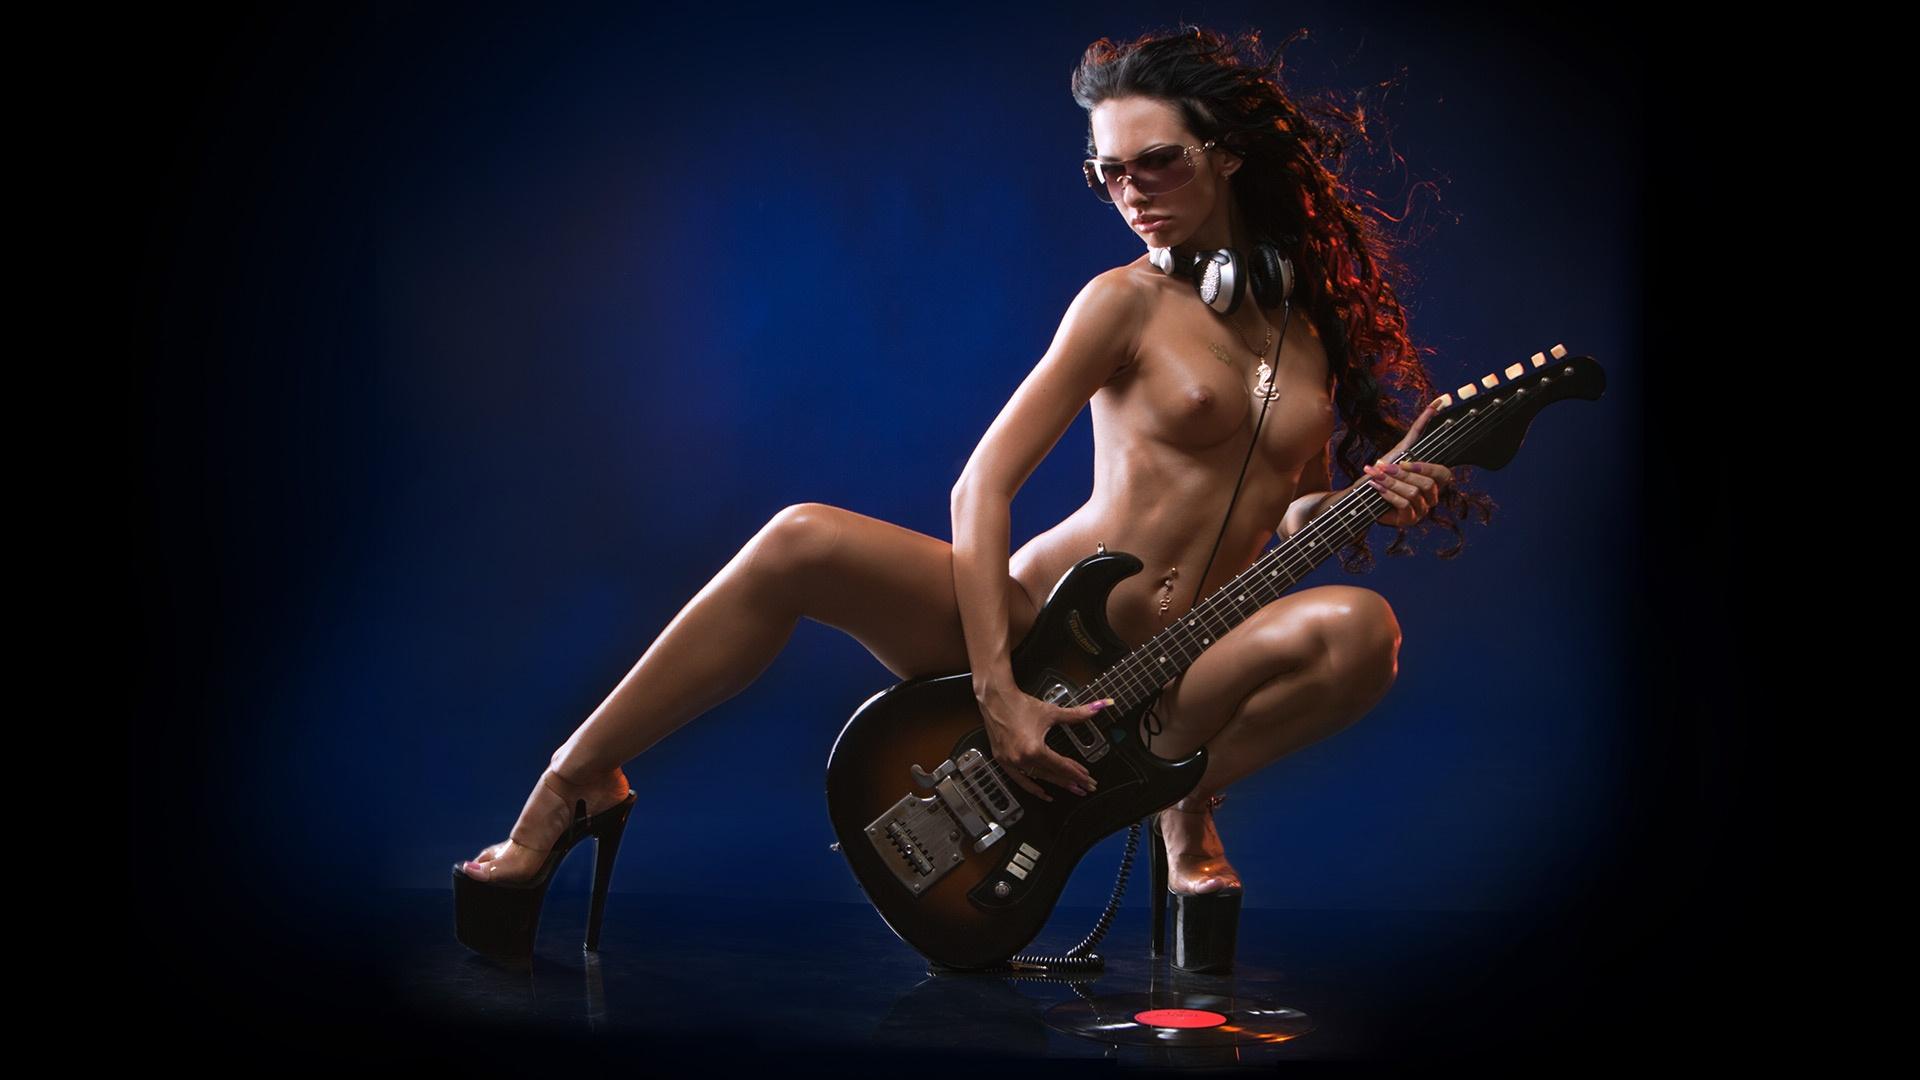 Guitar porn wallpaper softcore amateurs pussy